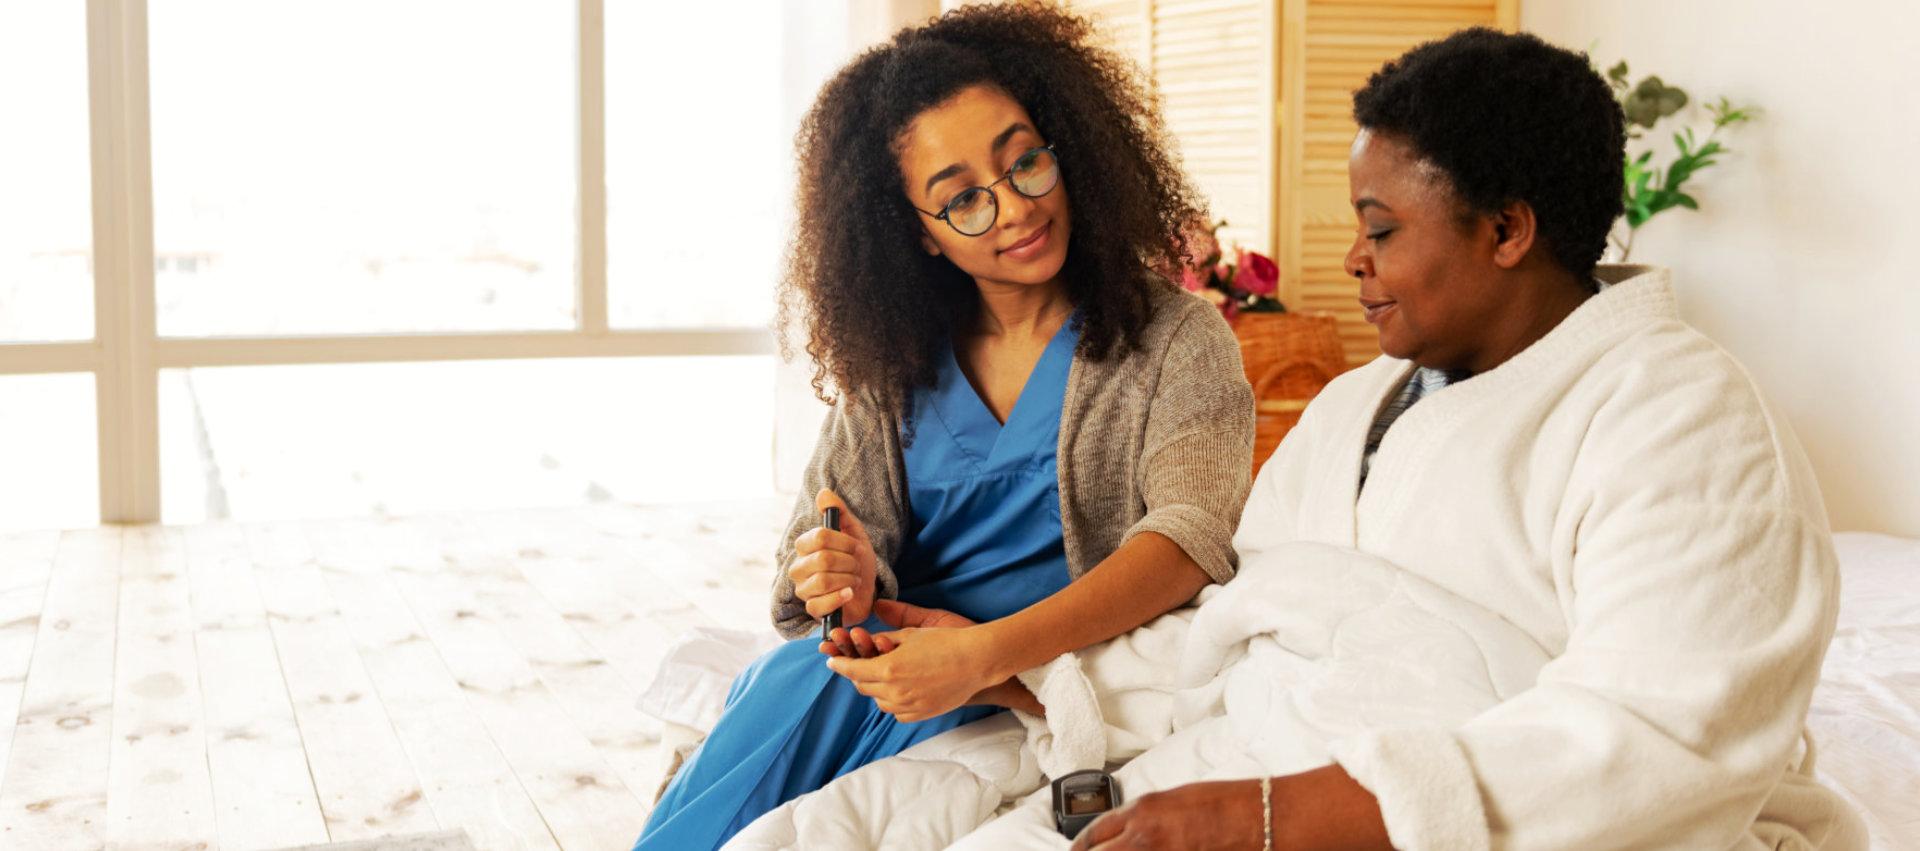 caregiver checking the sugar level of senior woman